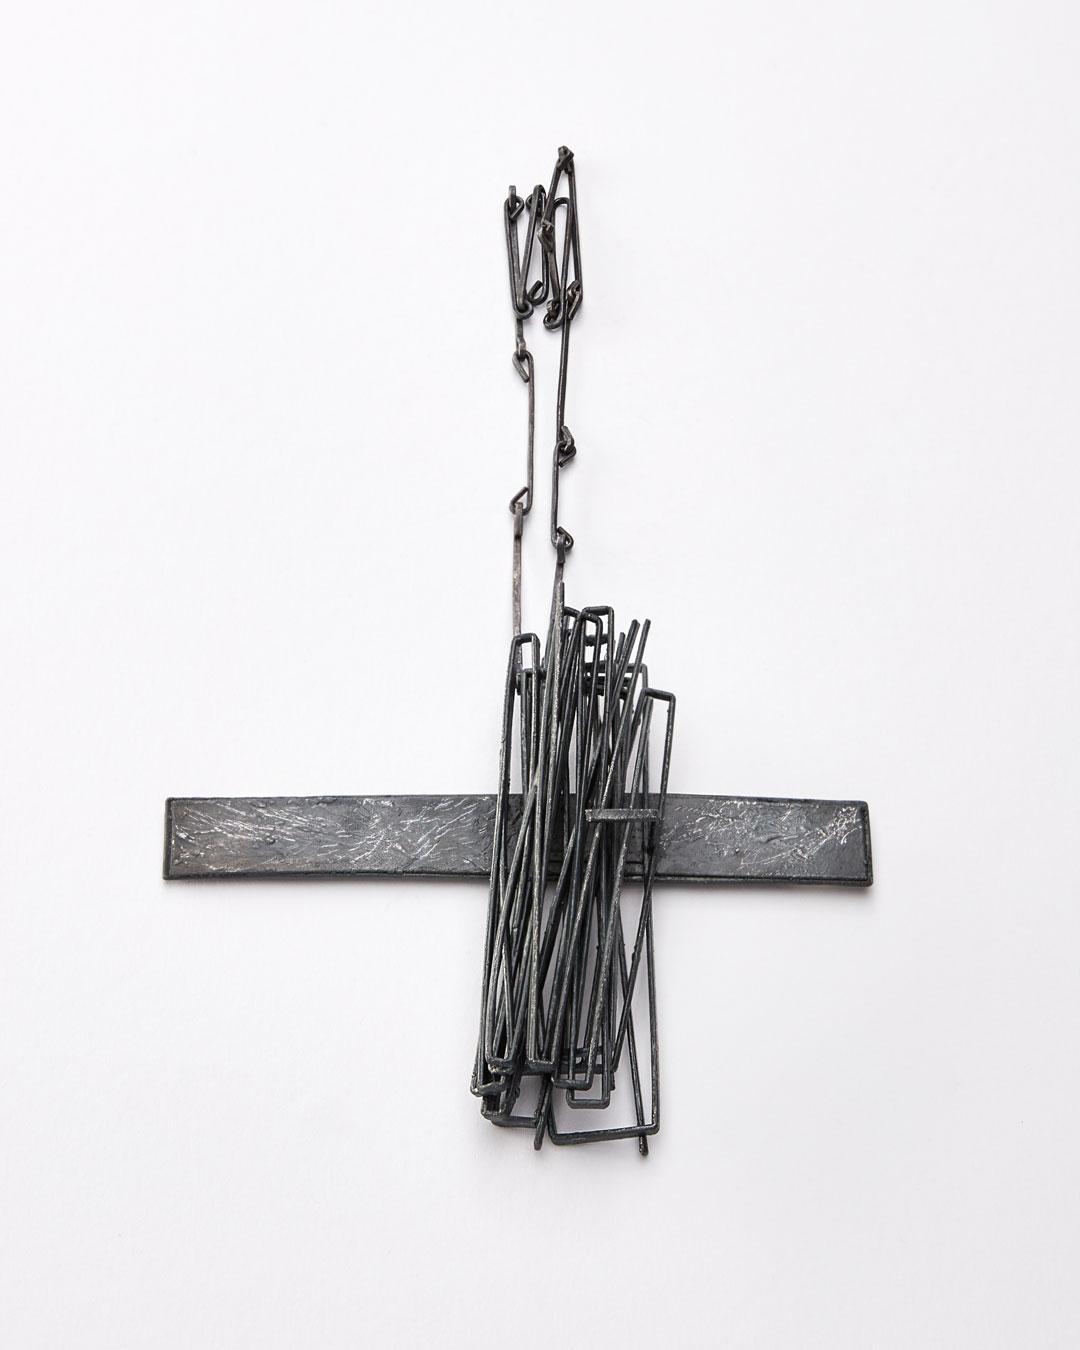 Iris Bodemer, Gegenüberstellung 4 (Juxtapositie 4), 2019, hanger; zilver, thermoplast, 110 x 140 x 25 mm, €3500